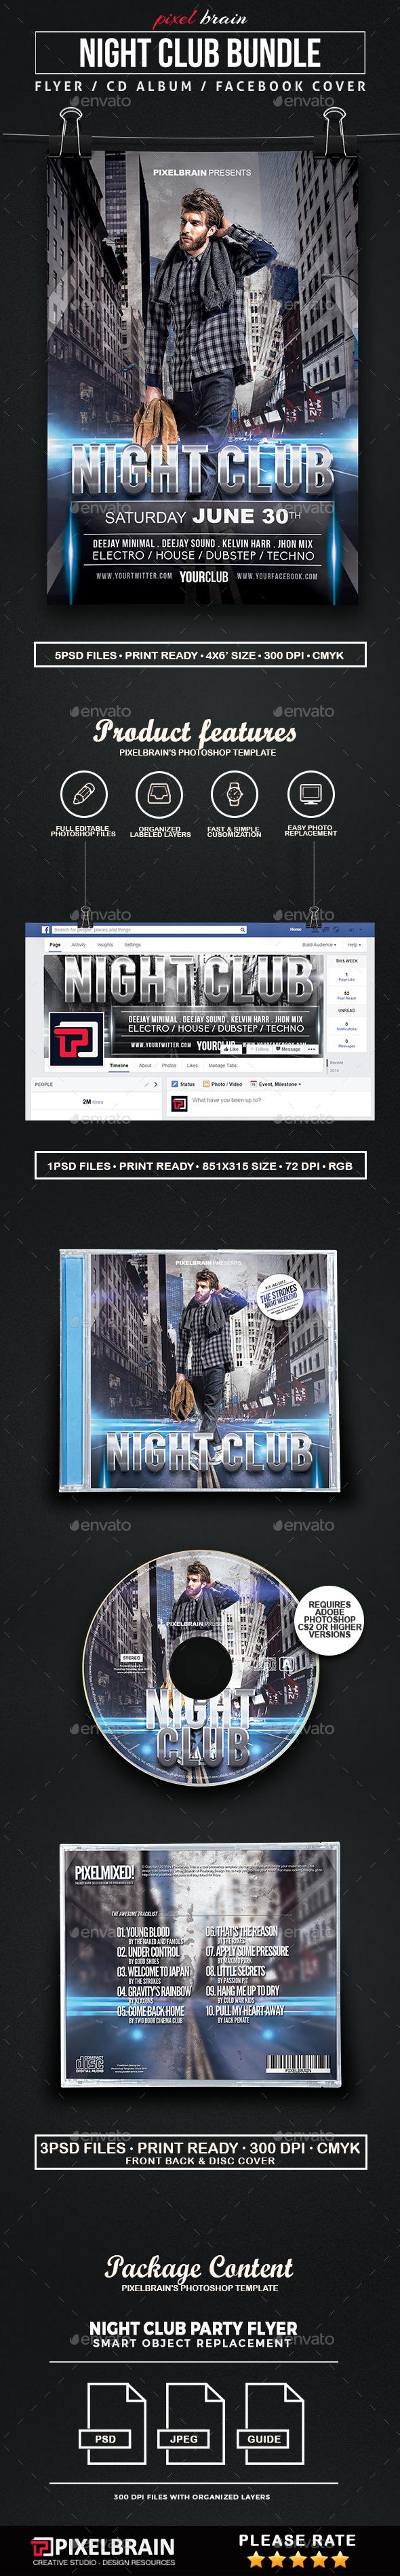 Night Club Party Template Bundle - Print Templates